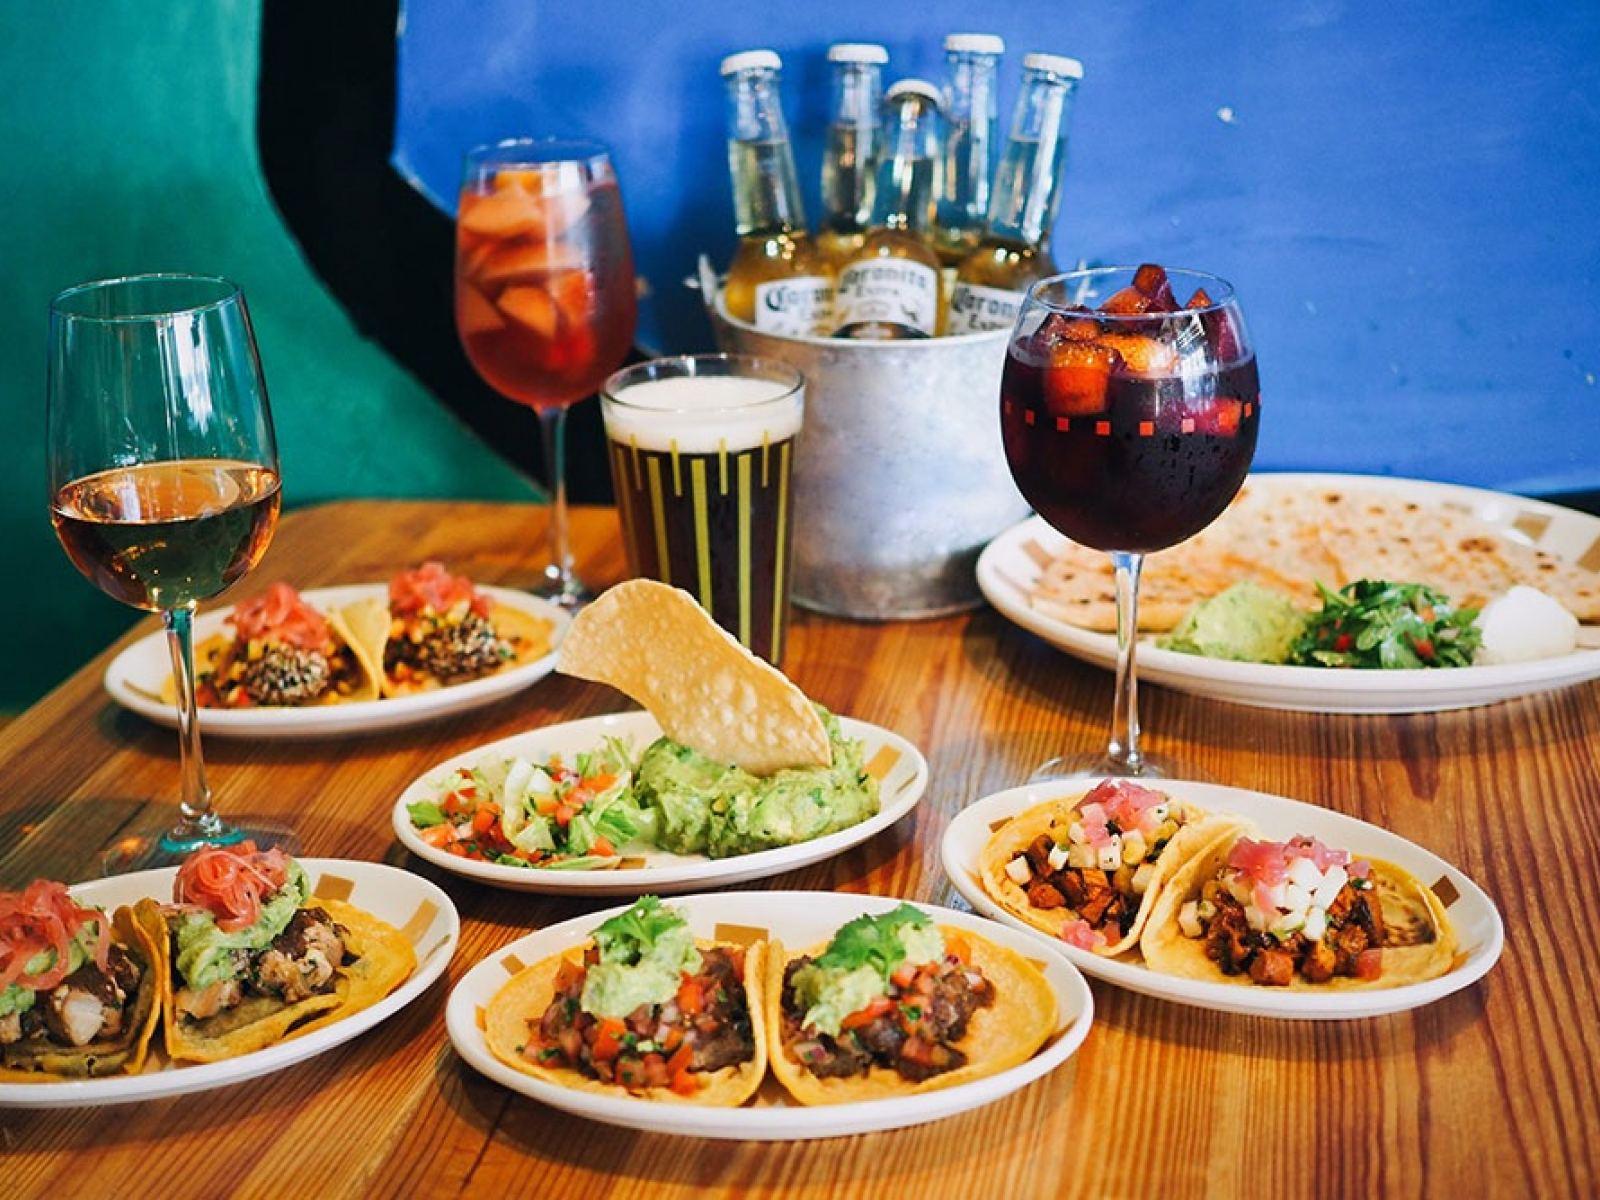 Border Grill DTLA Cinco de Mayo food and drinks